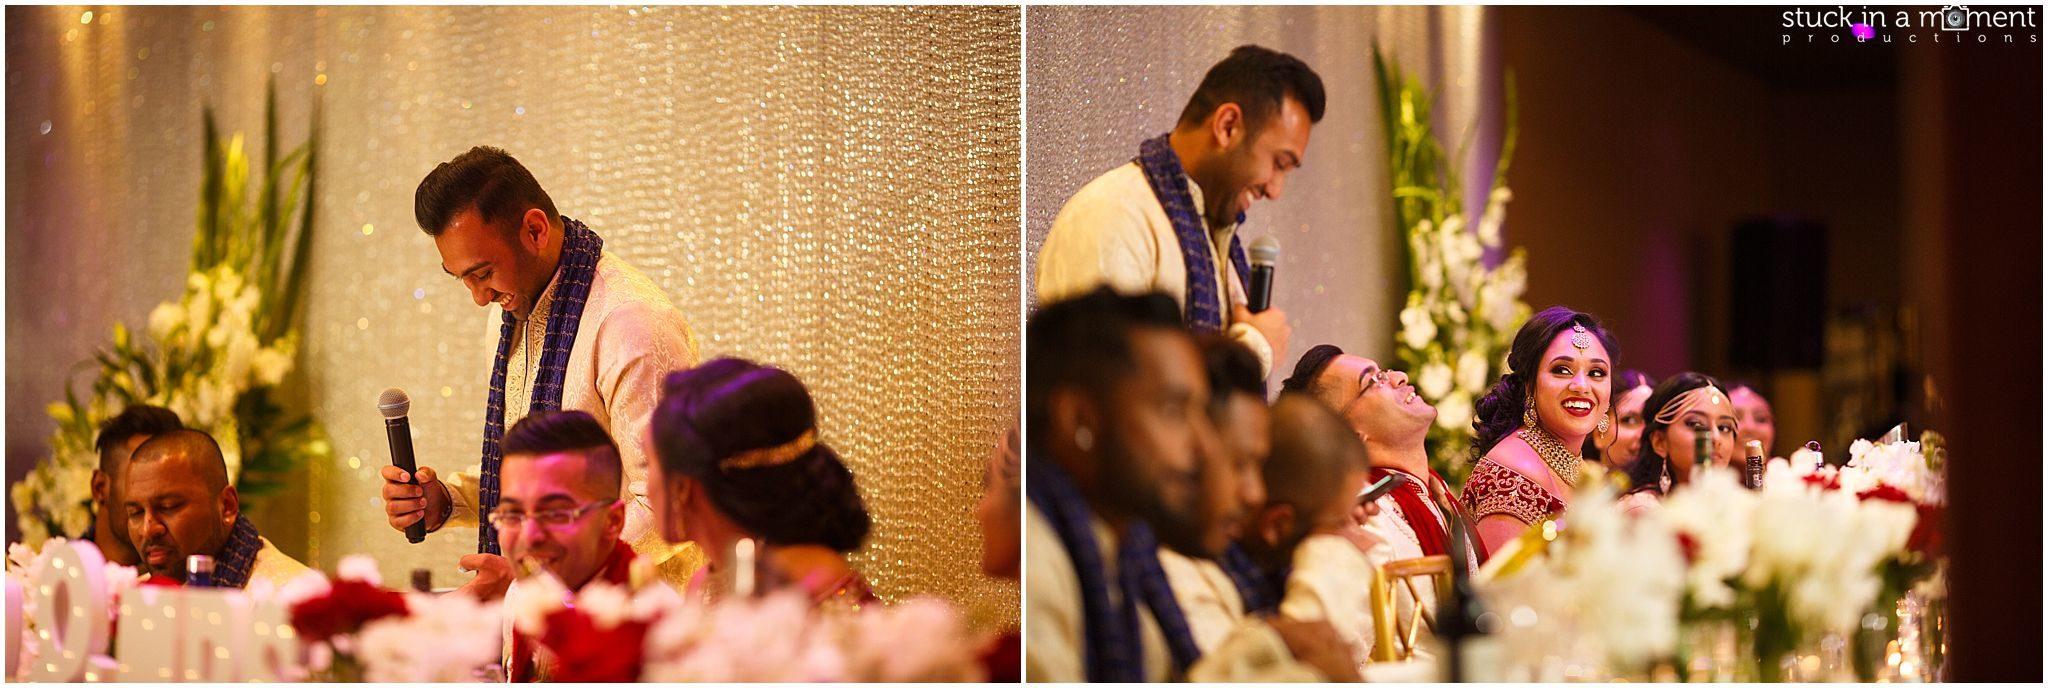 sydney wedding photographer videographer clarence house wedding